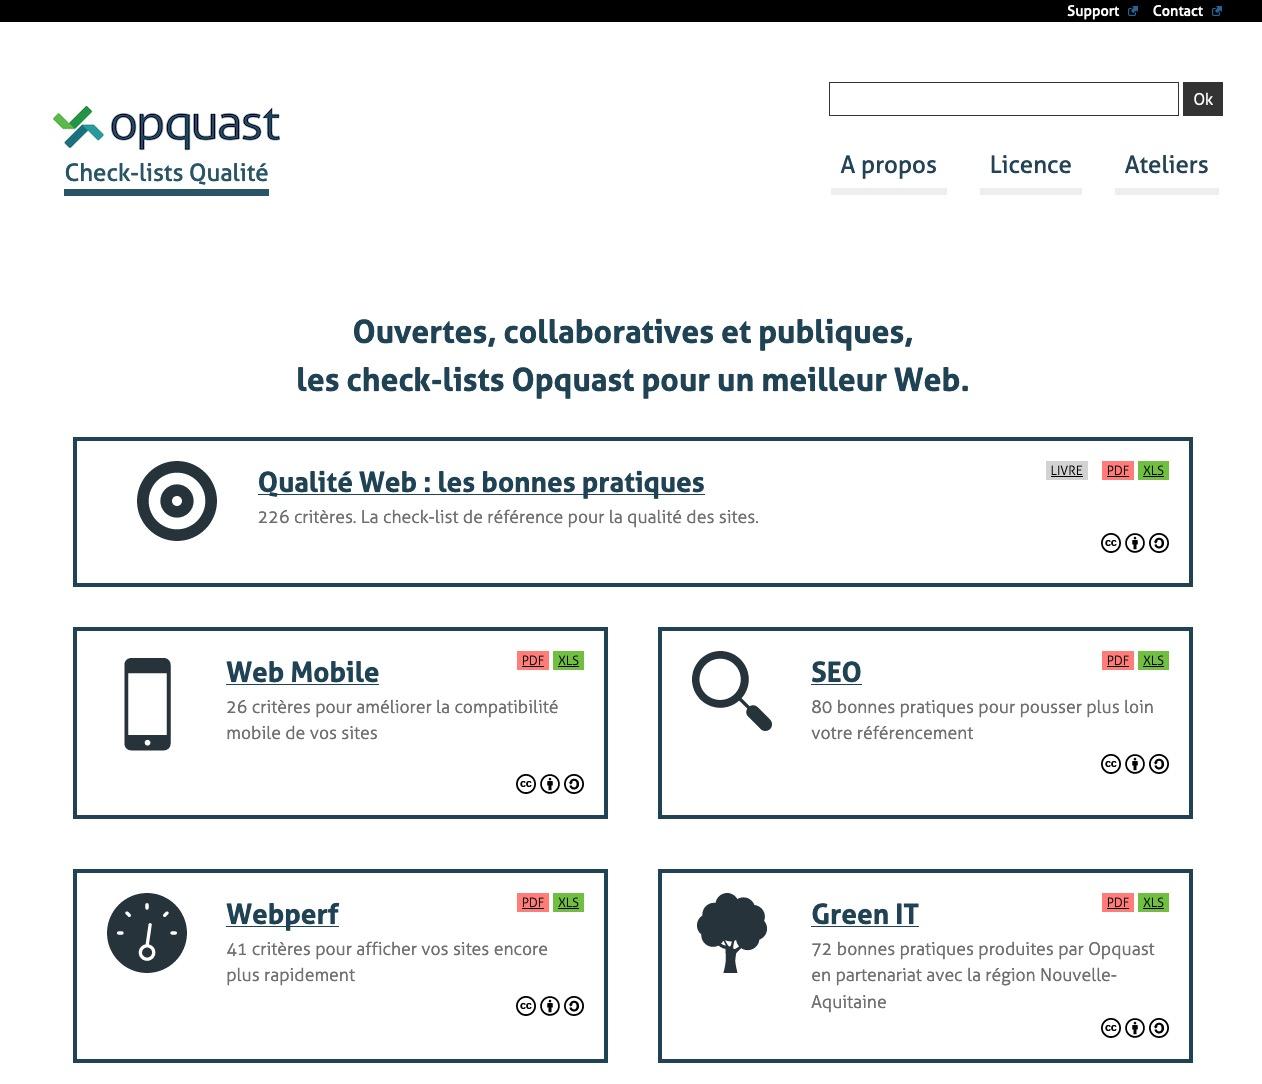 Capture de la home de Opquast